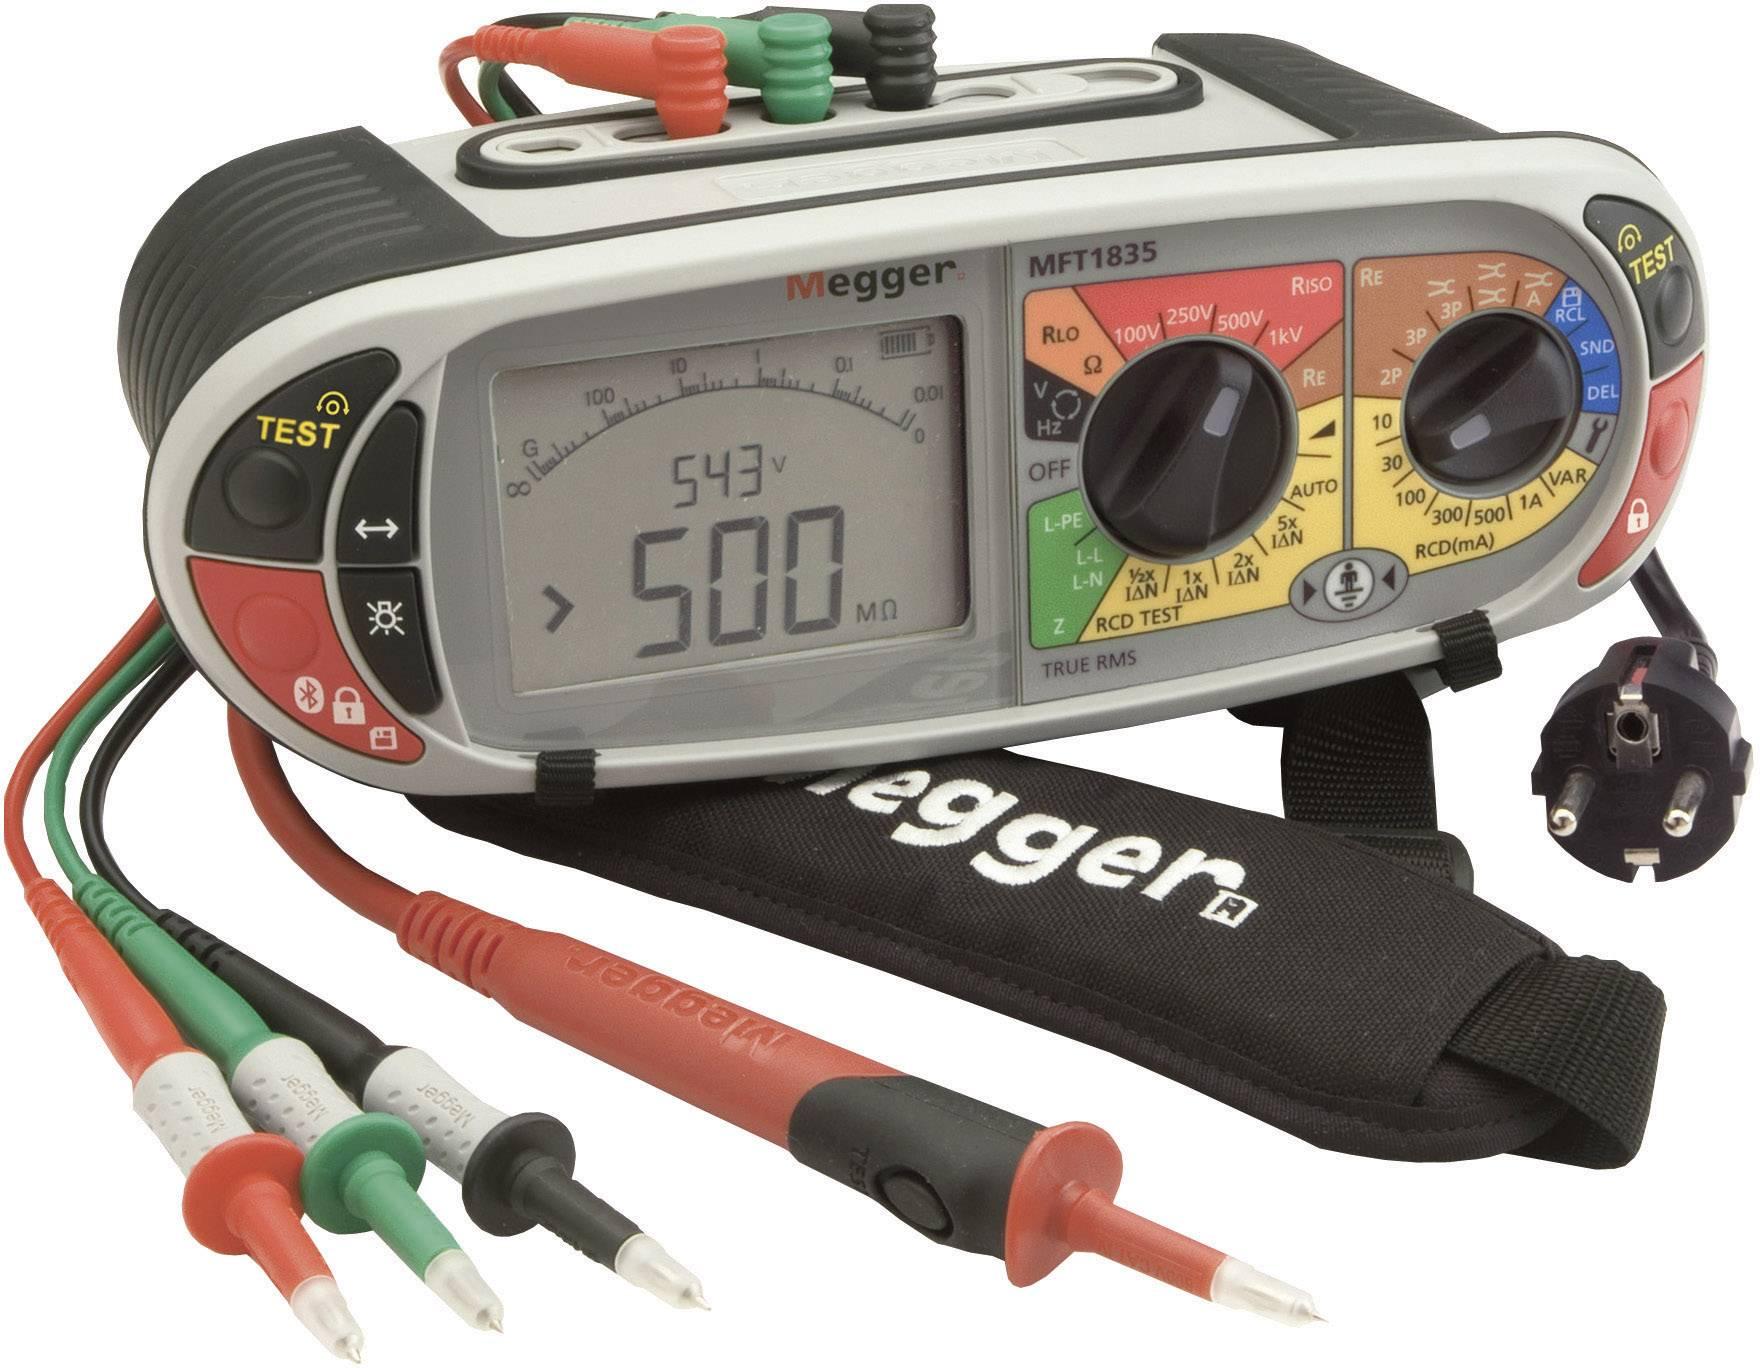 Megger MFT1835-DE+SW Electrical tester Measurements according to DIN